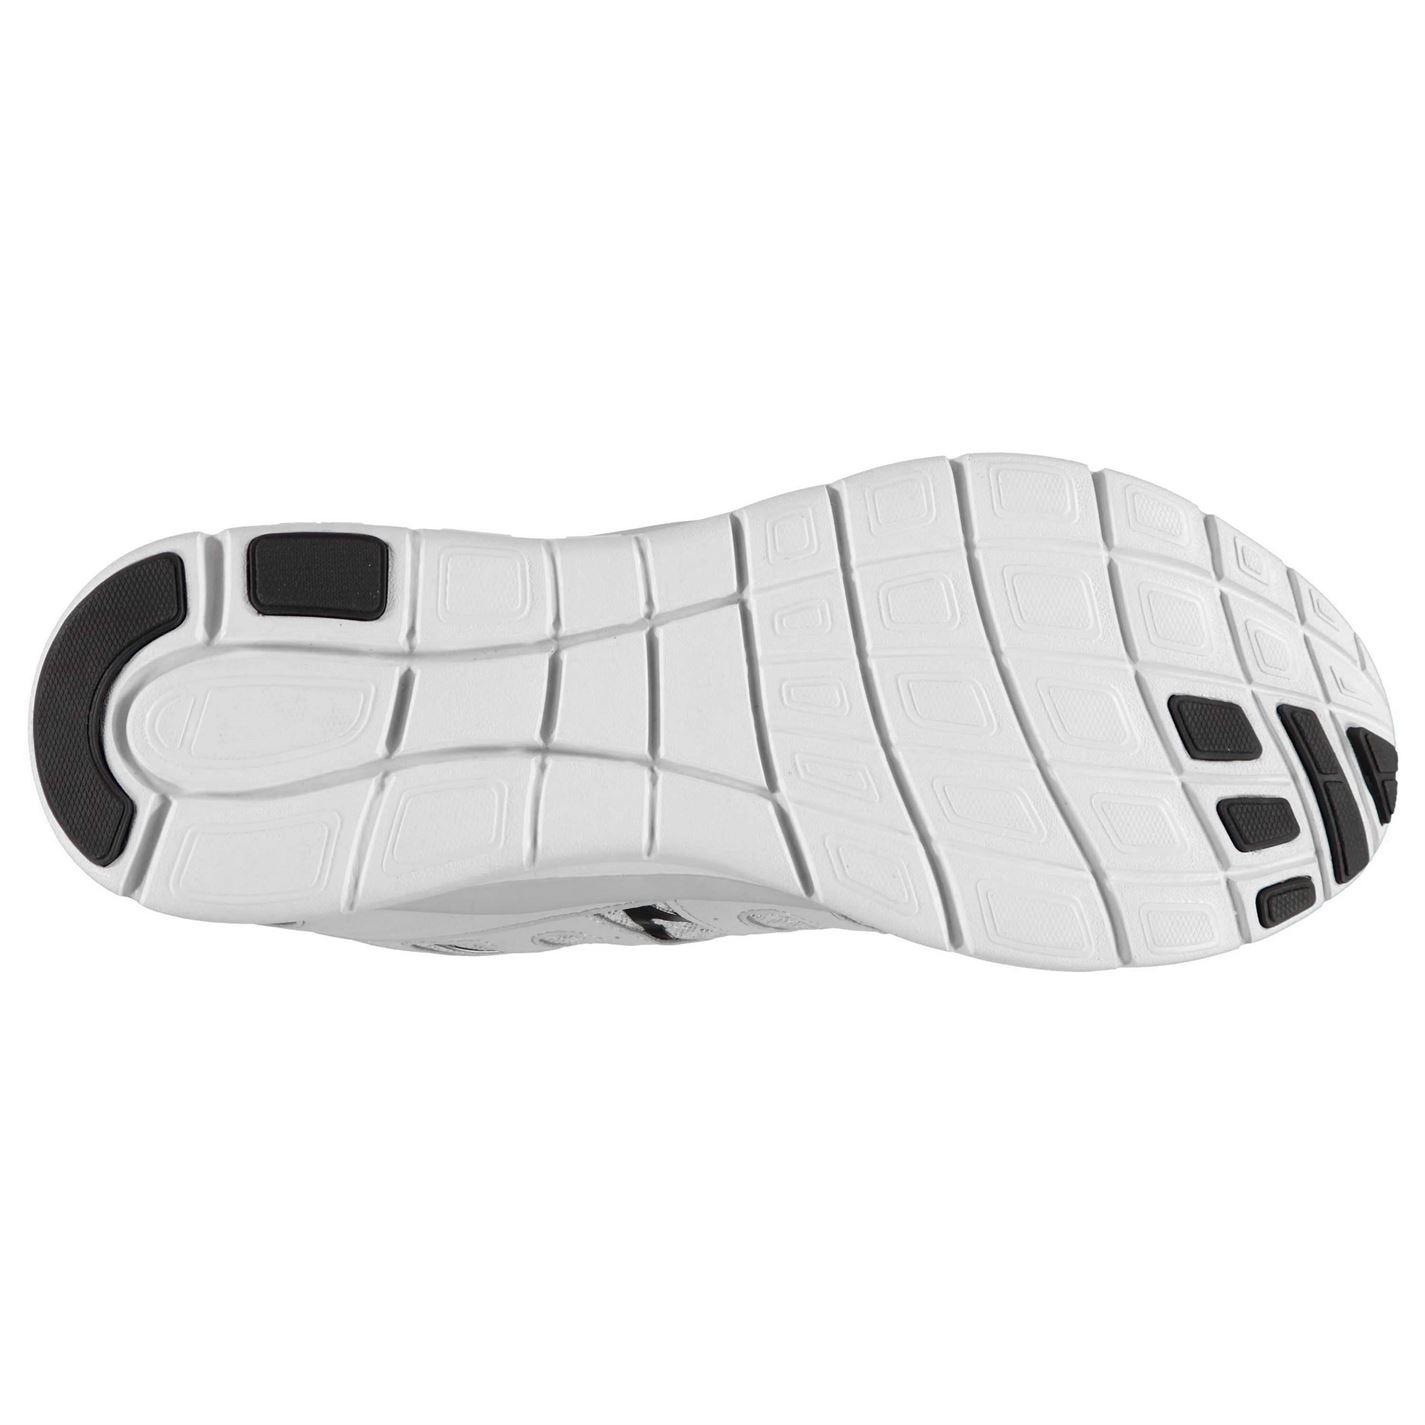 Karrimor-Mens-Duma-Trainers-Lace-Up-Sports-Running-Cross-Training-Shoes thumbnail 47